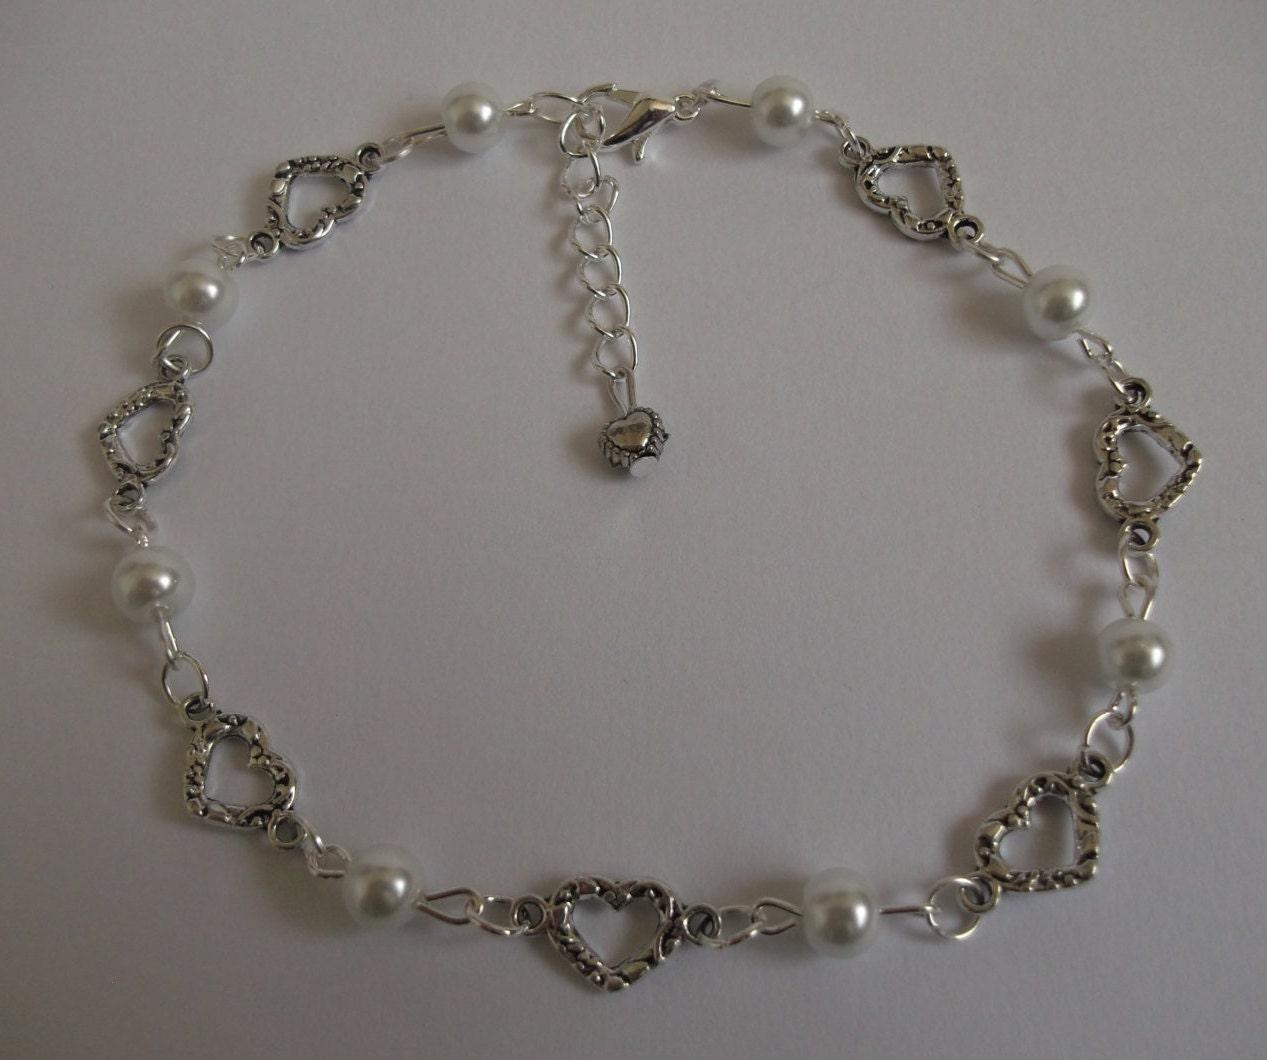 Pearl anklet heart anklet ankle bracelet ankle chain bridal anklet bridal jewellery prom anklet white pearl anklet beach anklet